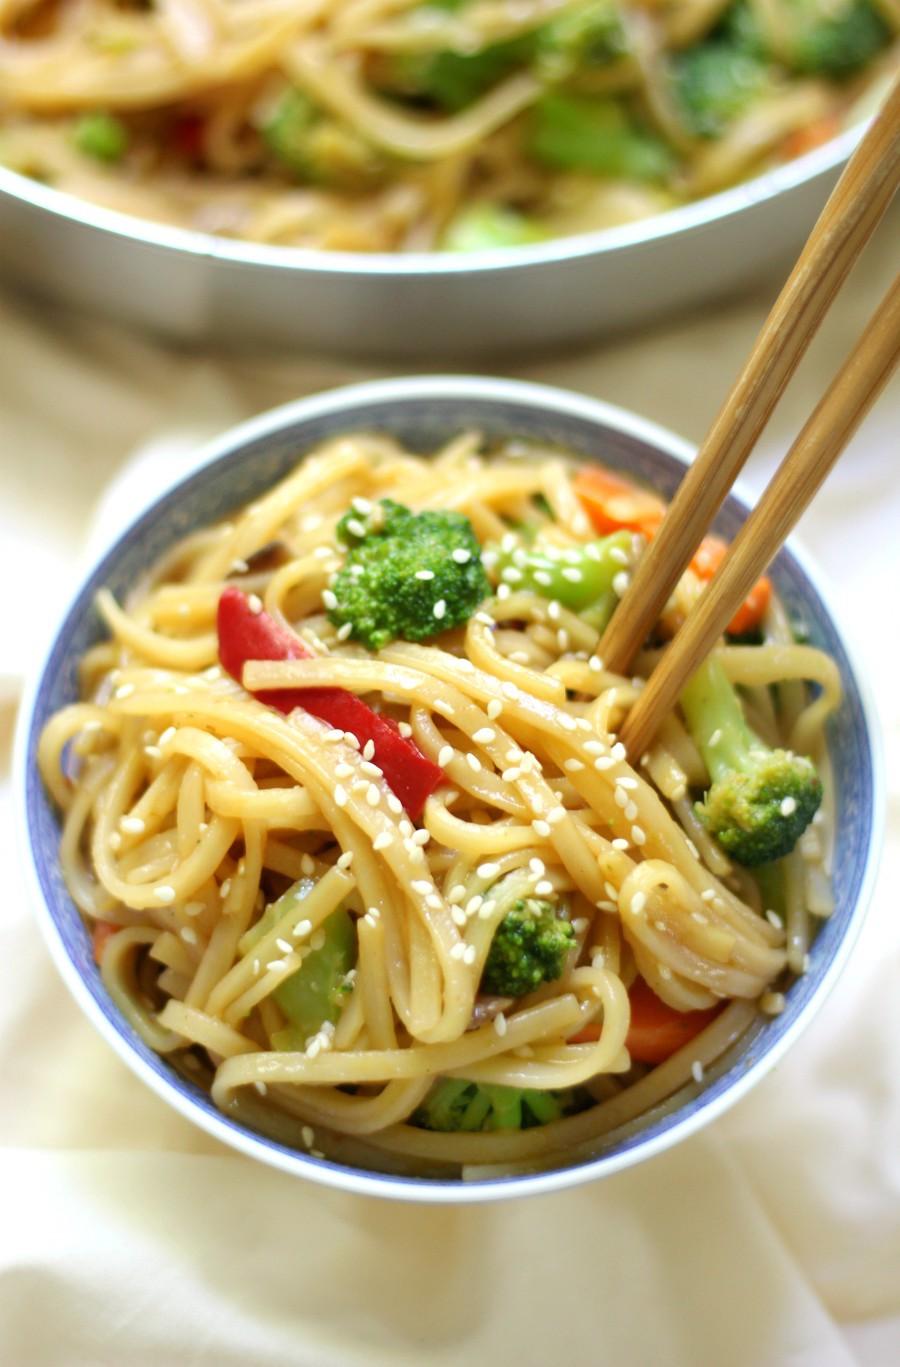 10-Minute Gluten-Free Vegetable Lo Mein